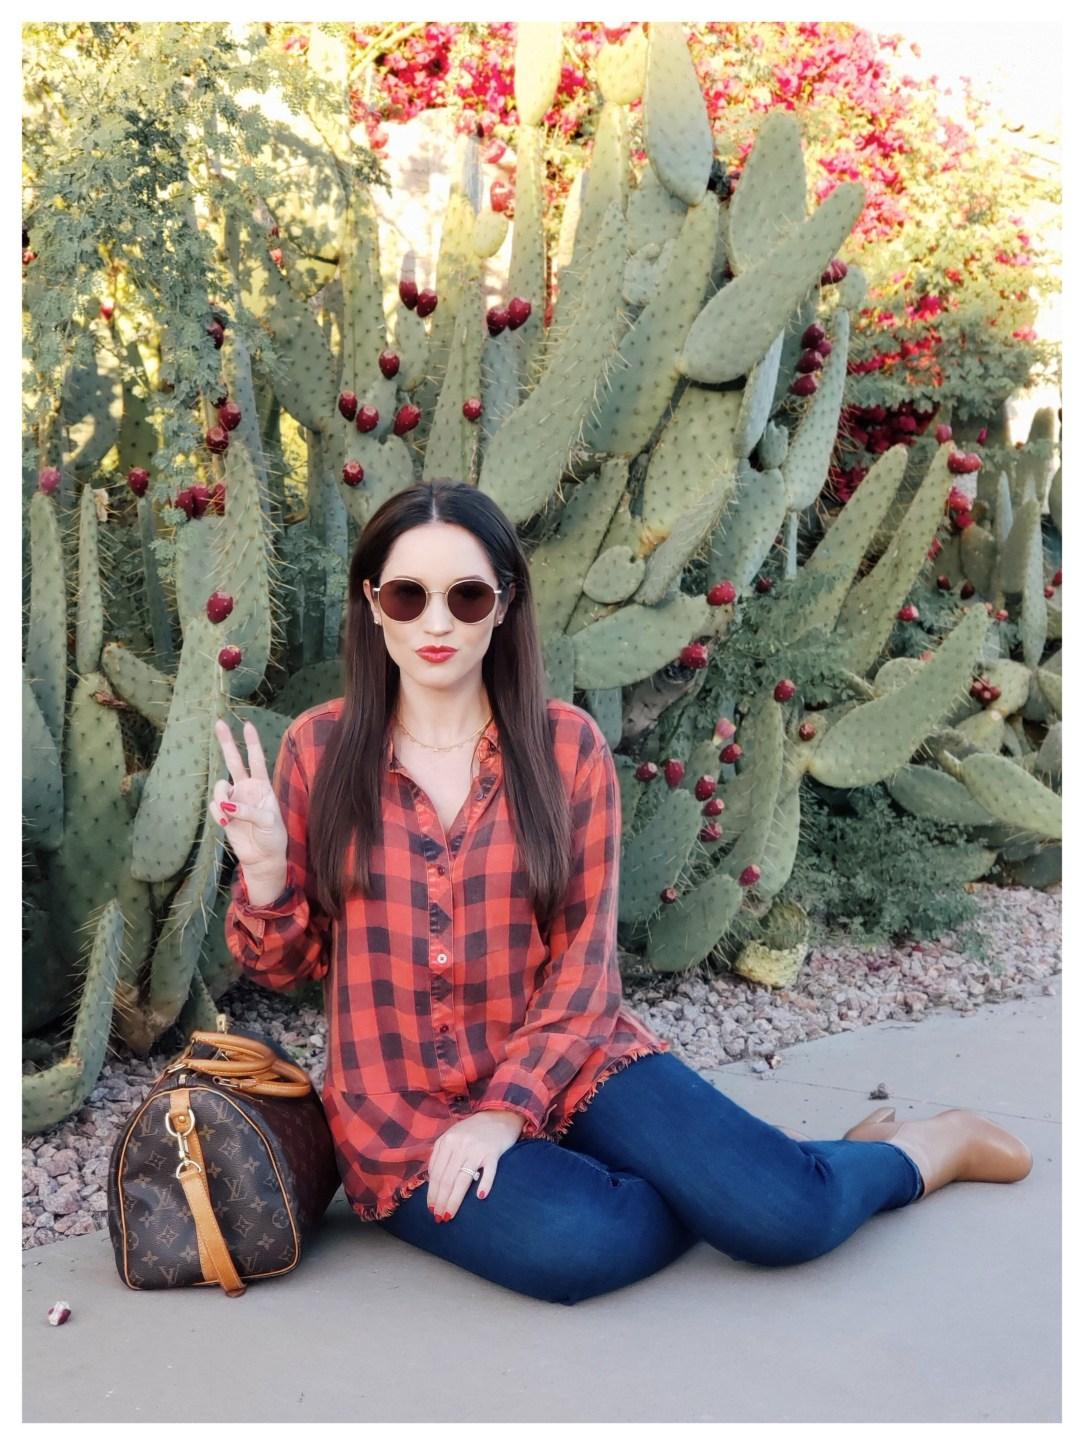 Petite Fashion Blogger Five Foot Feminine in Wit & Wisdom Peplum Plaid Shirt